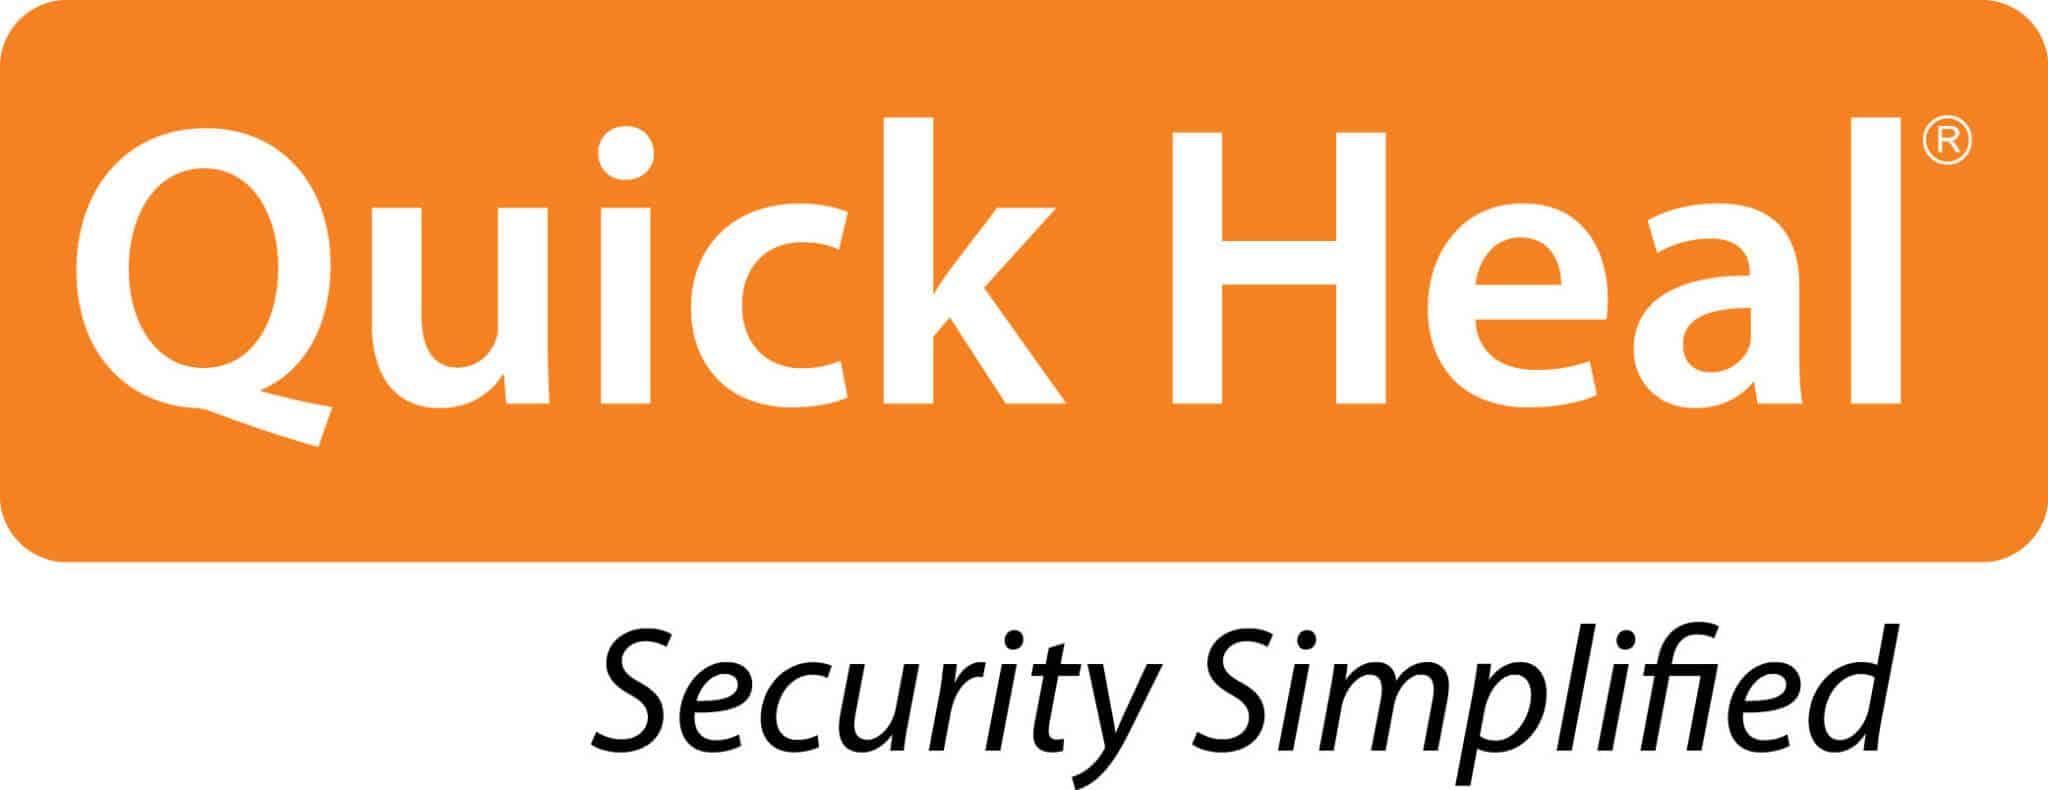 Best Free Antivirus Android